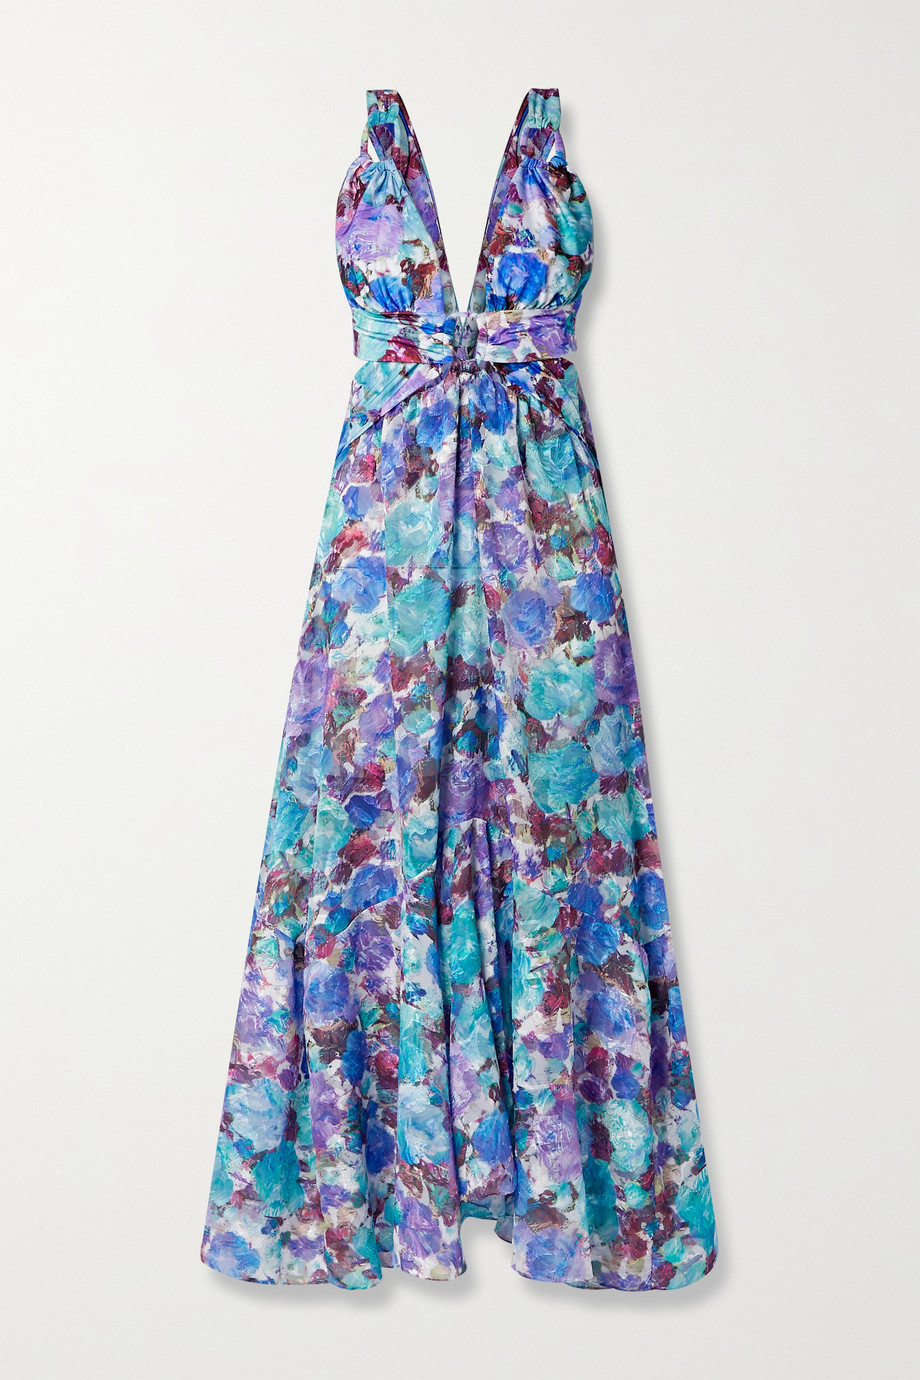 PatBO Blossom cutout floral-print jacquard maxi dress